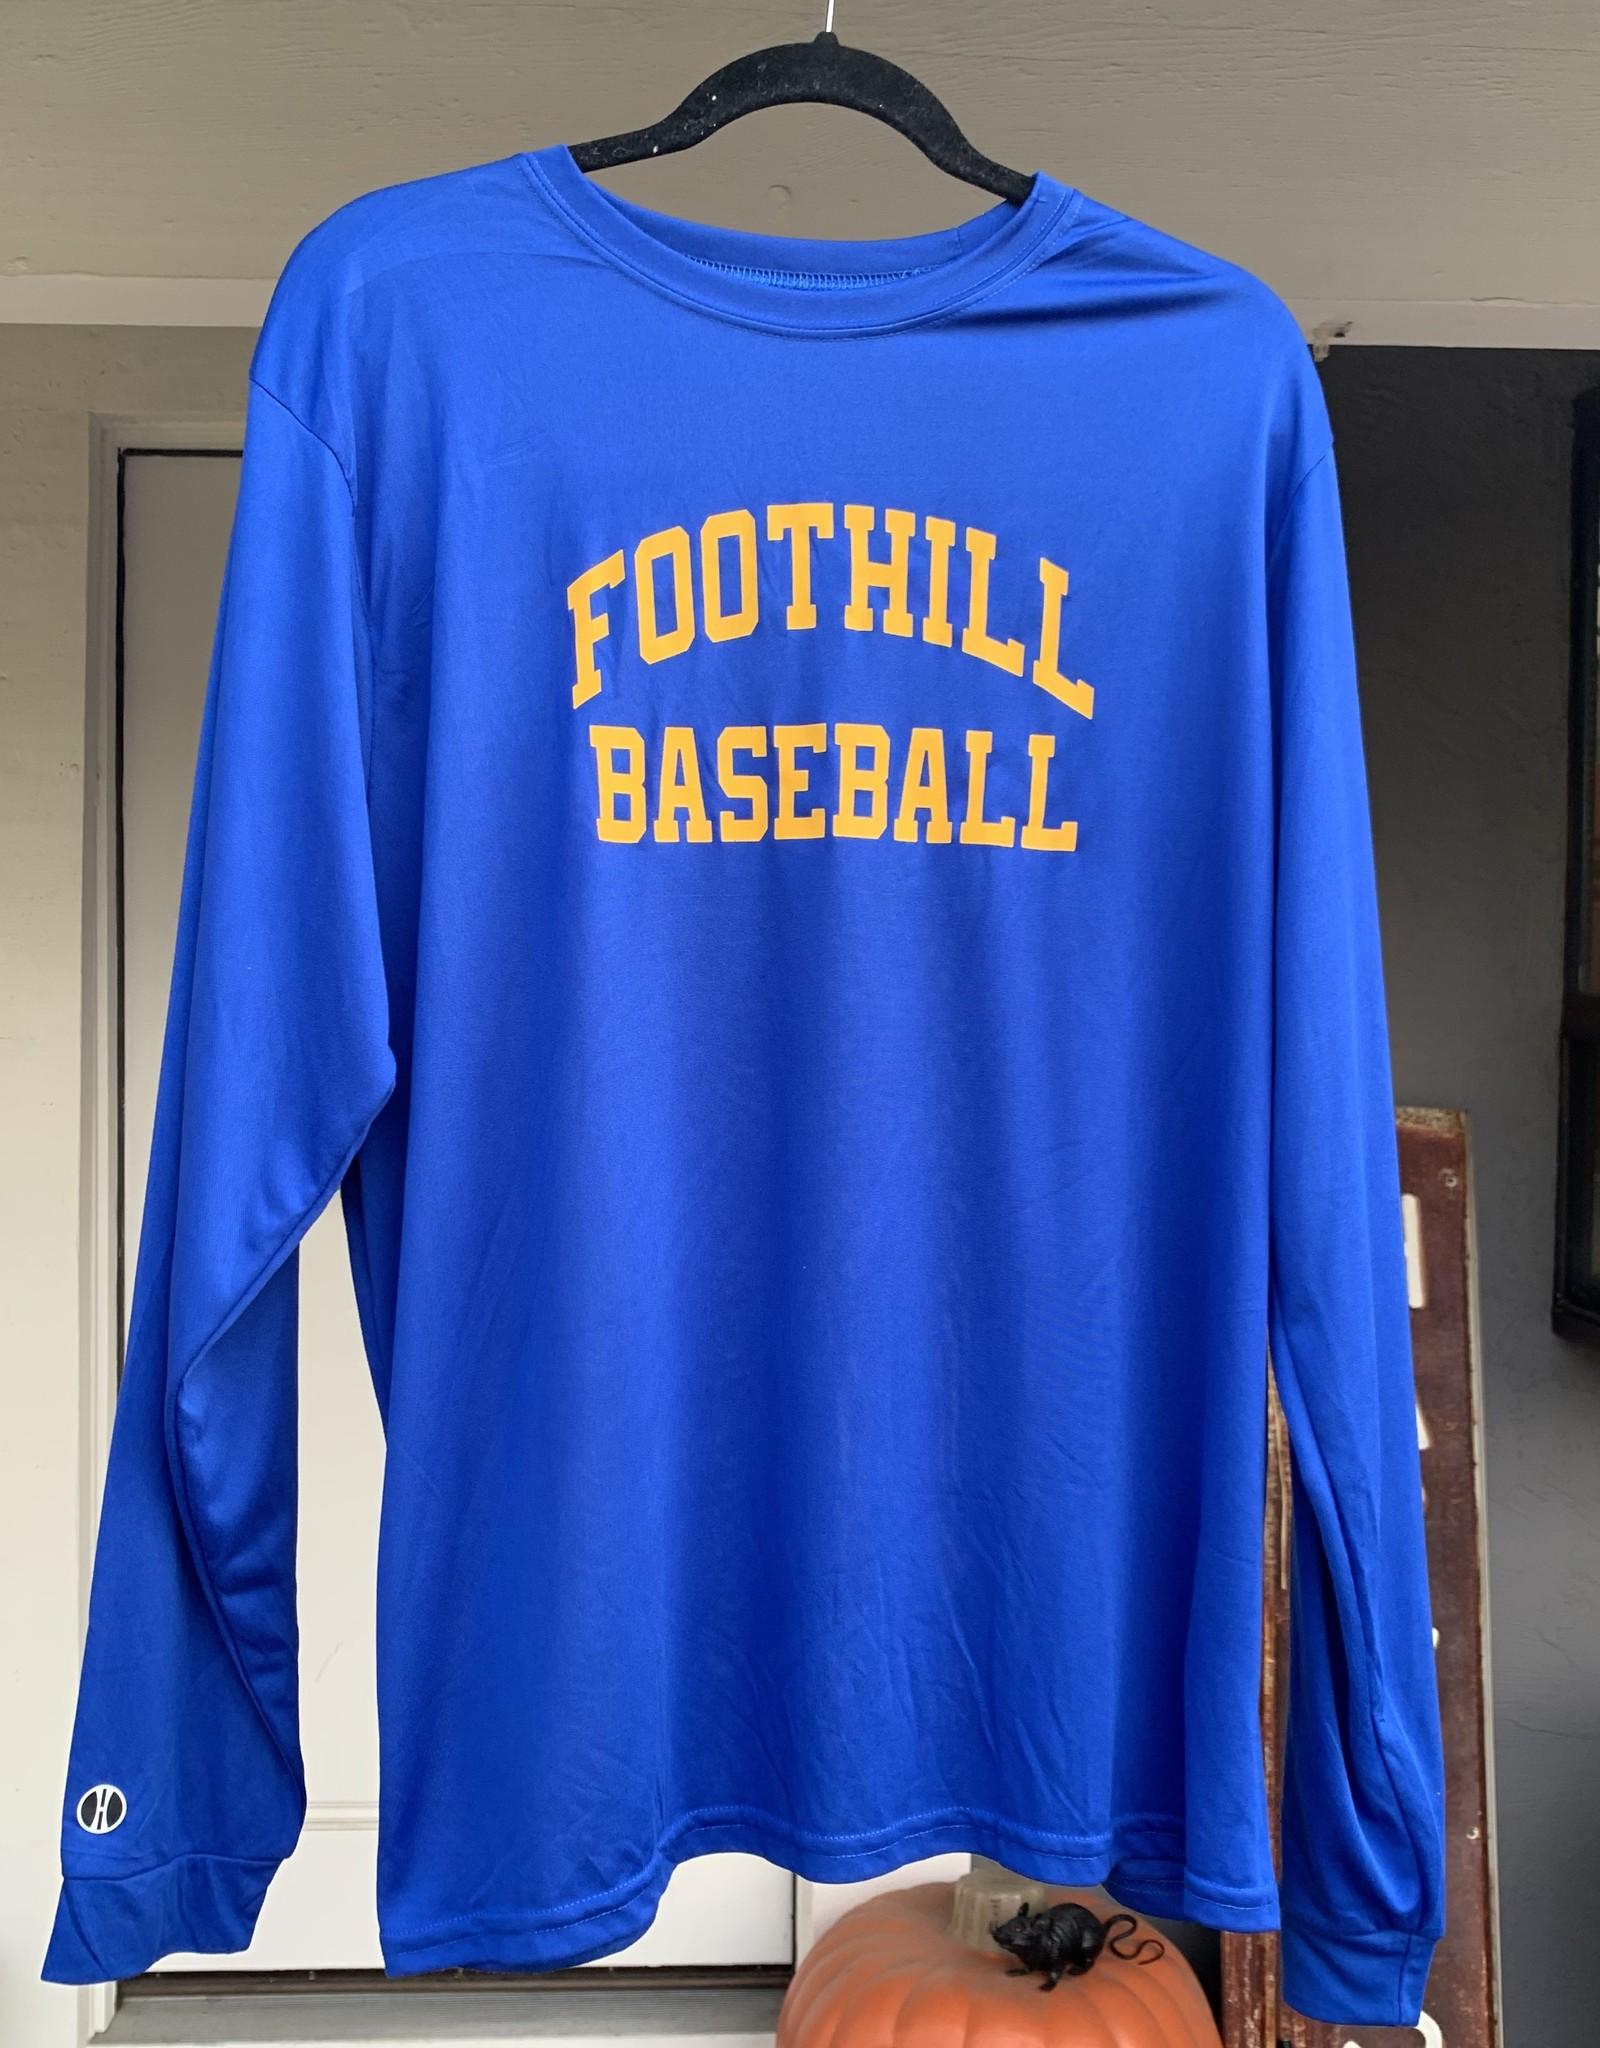 Blue Long-sleeve Foothill Baseball Shirt